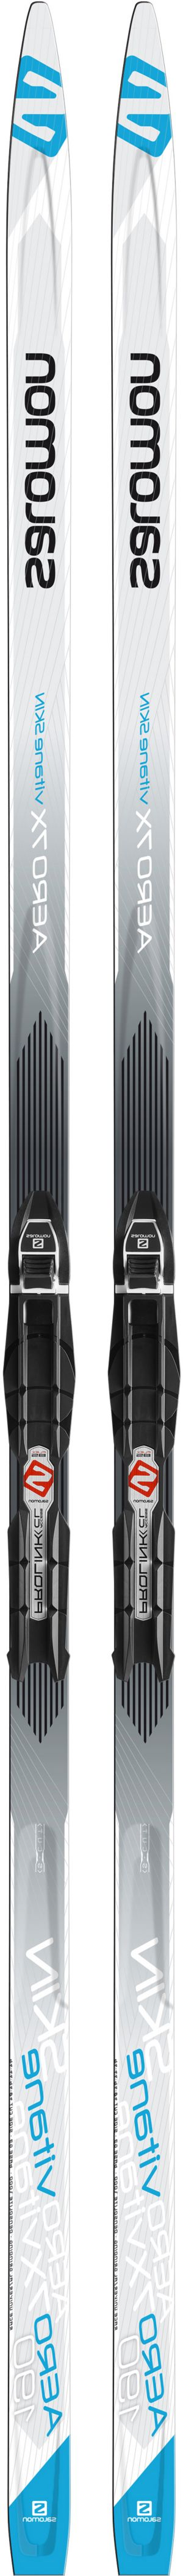 Aero 7X Vitane Skin